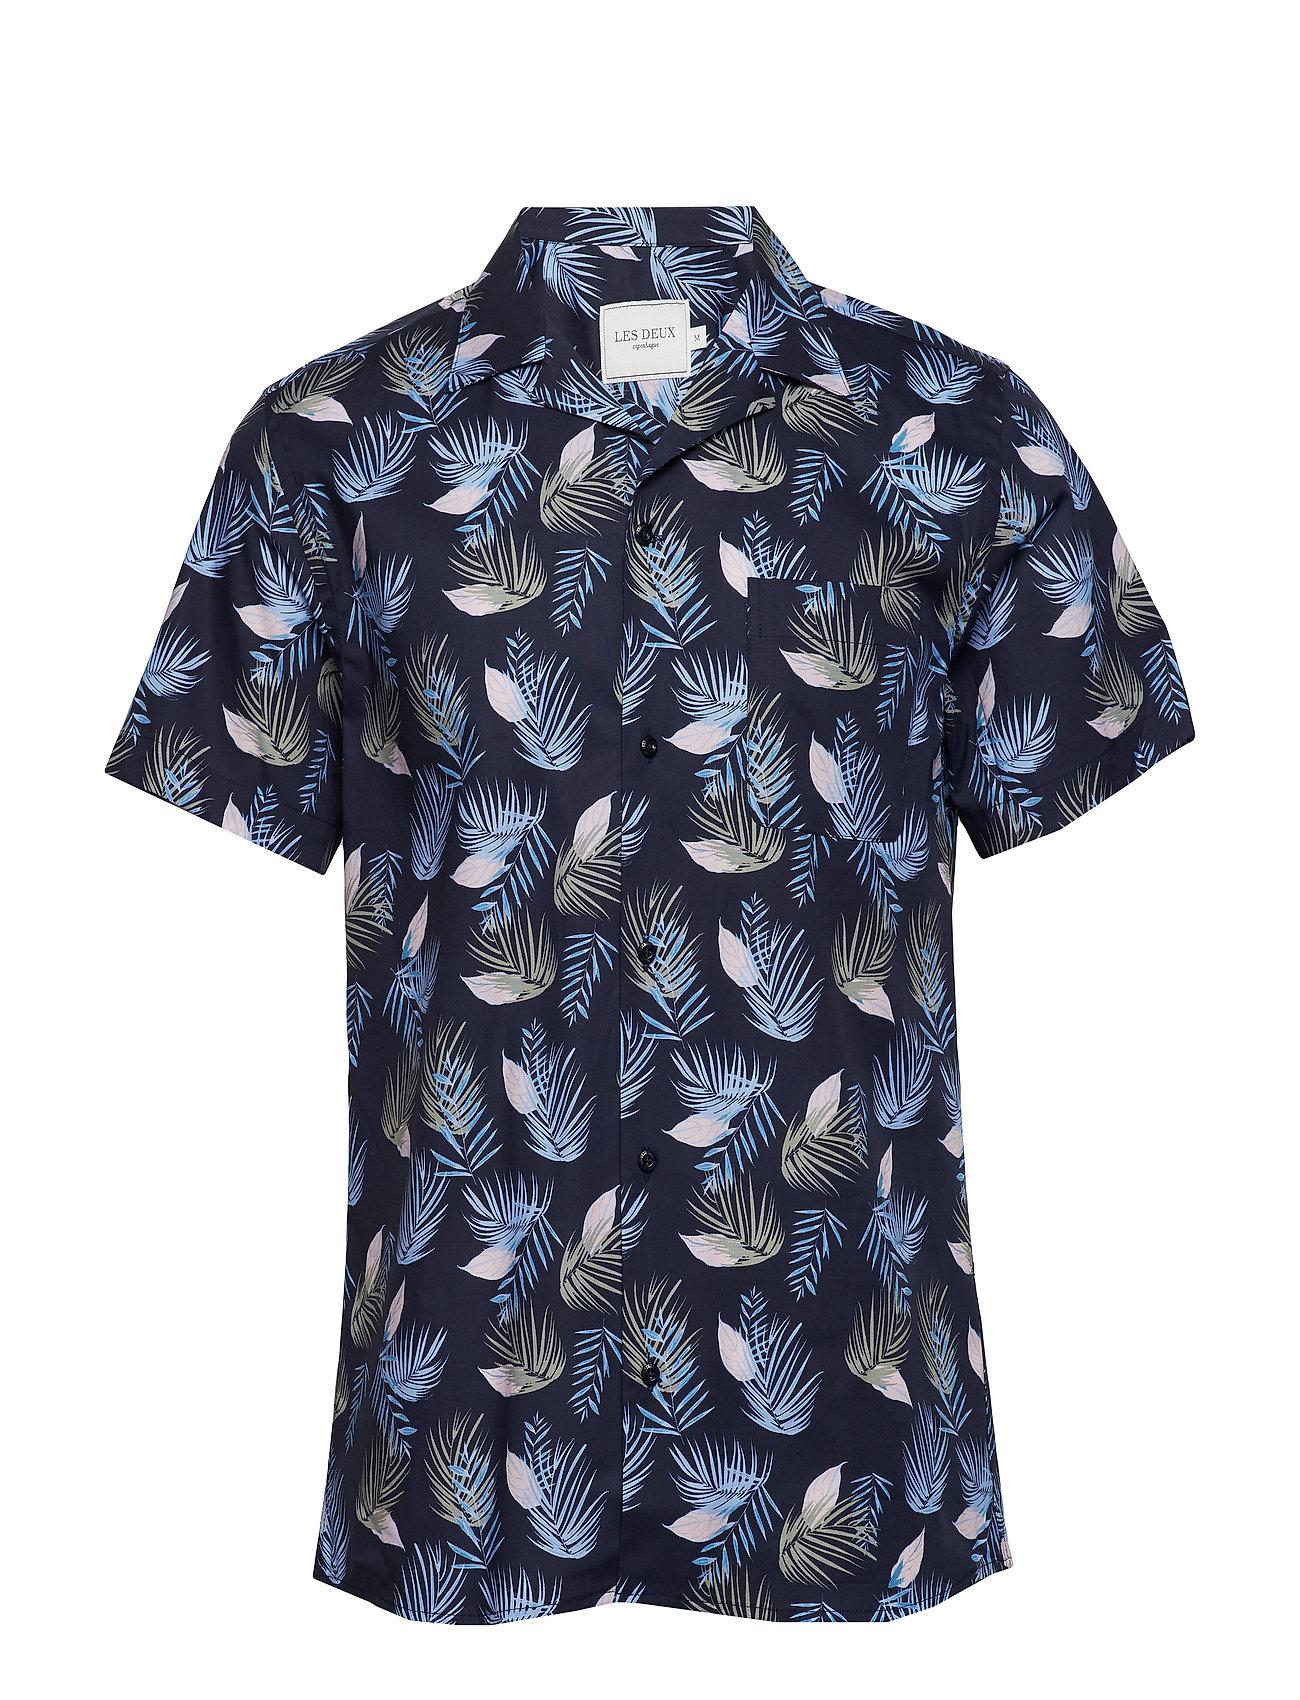 Les Deux Polynesia Shirt - DARK NAVY